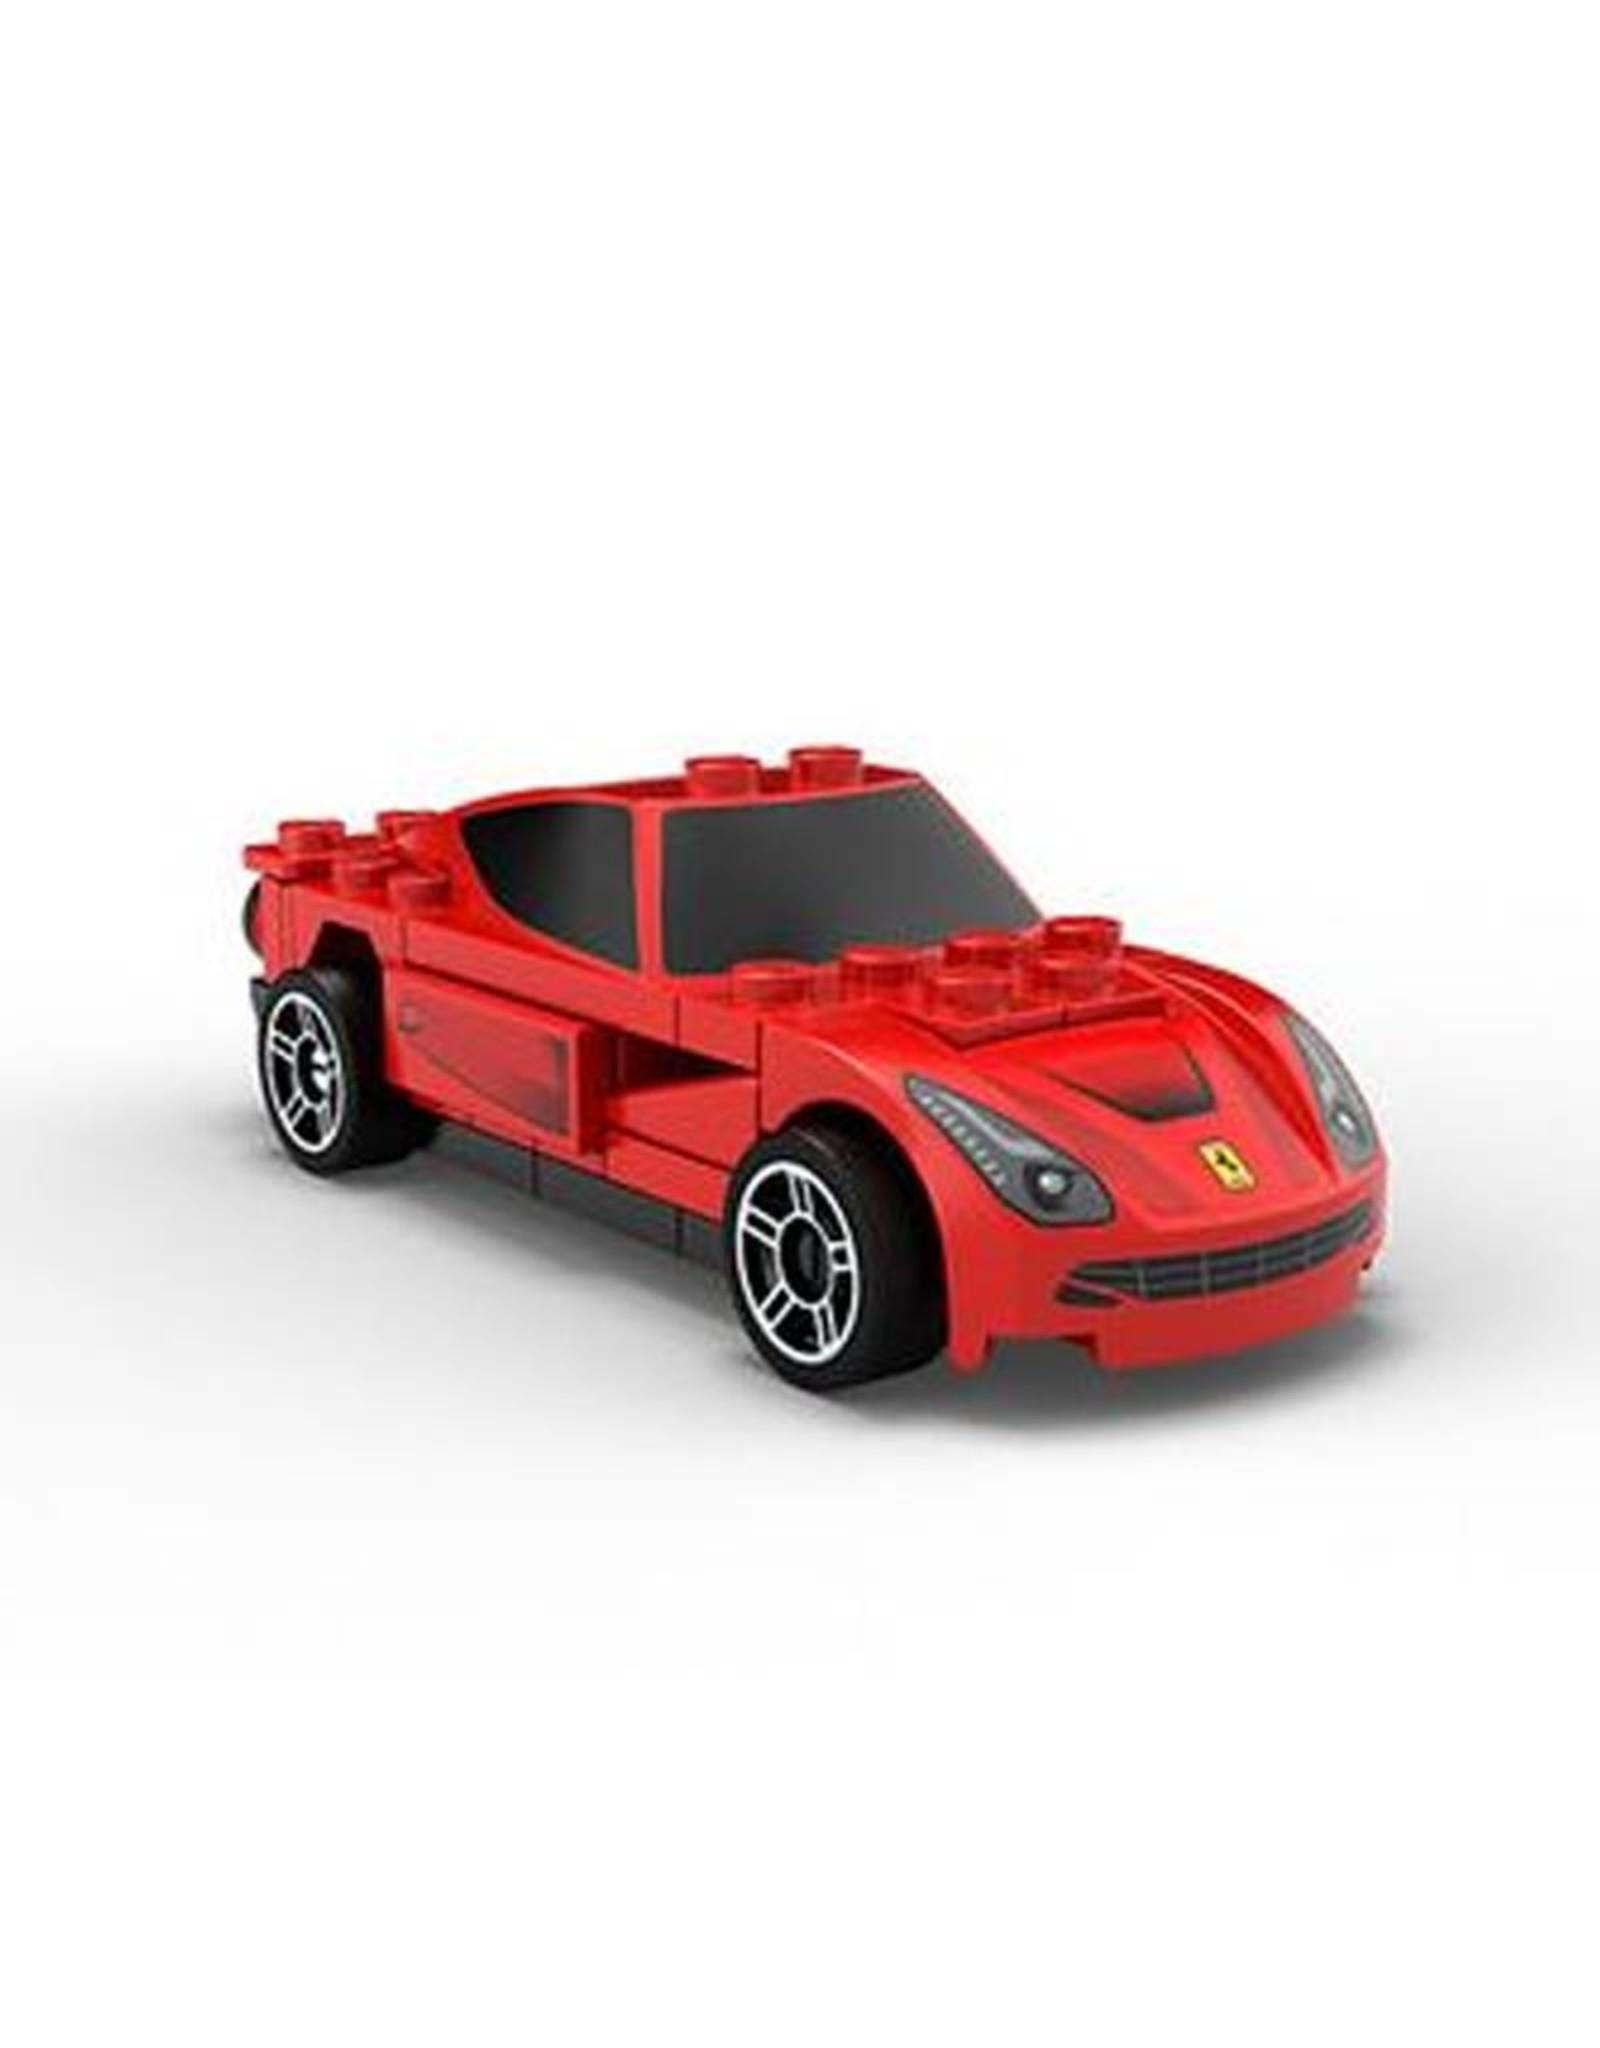 LEGO LEGO 40191 Ferrari F12 Berlinetta V-POWER